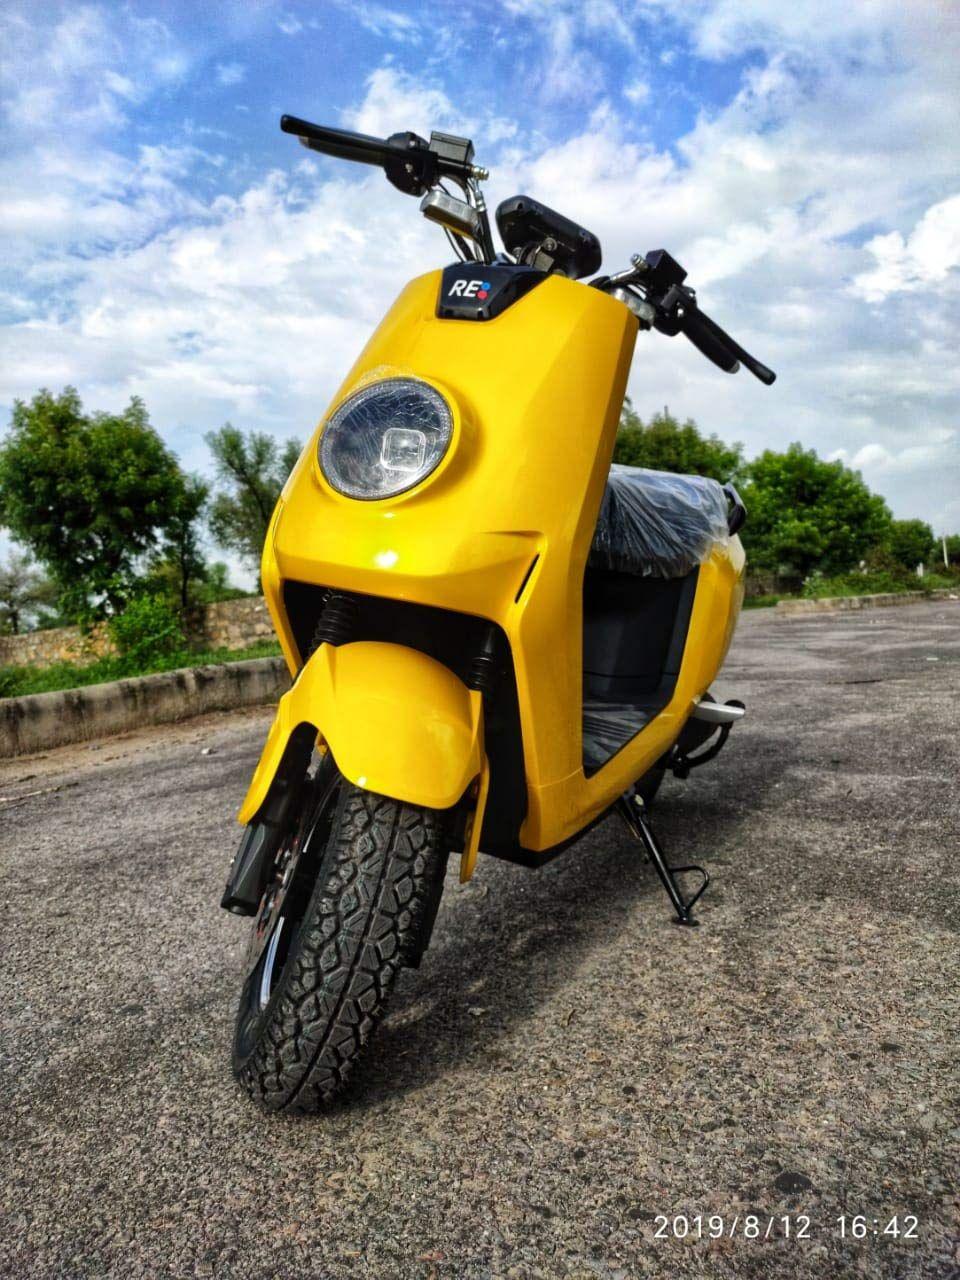 Pin on MotorBike Accessories Deals